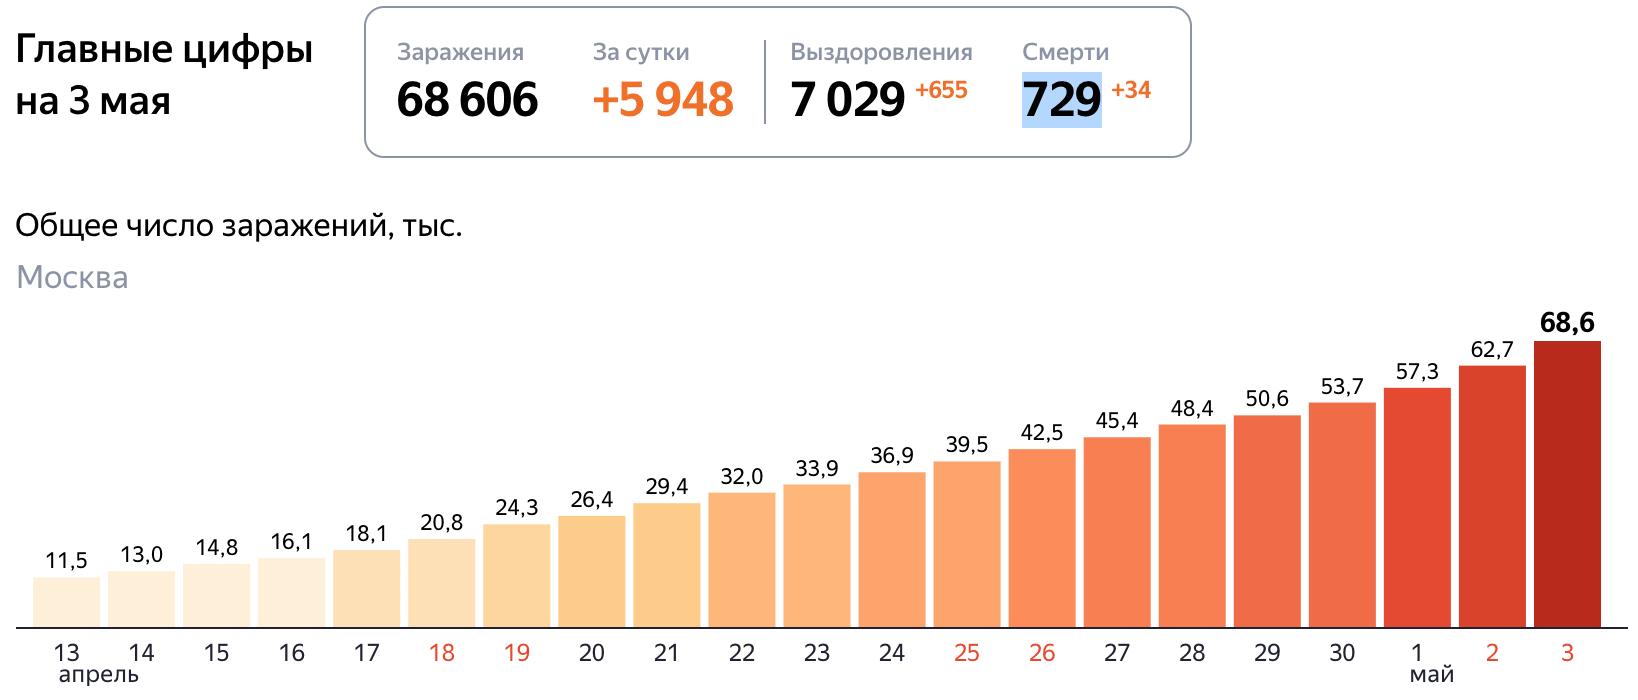 Короновирус статистика в России 3 мая 2020 год